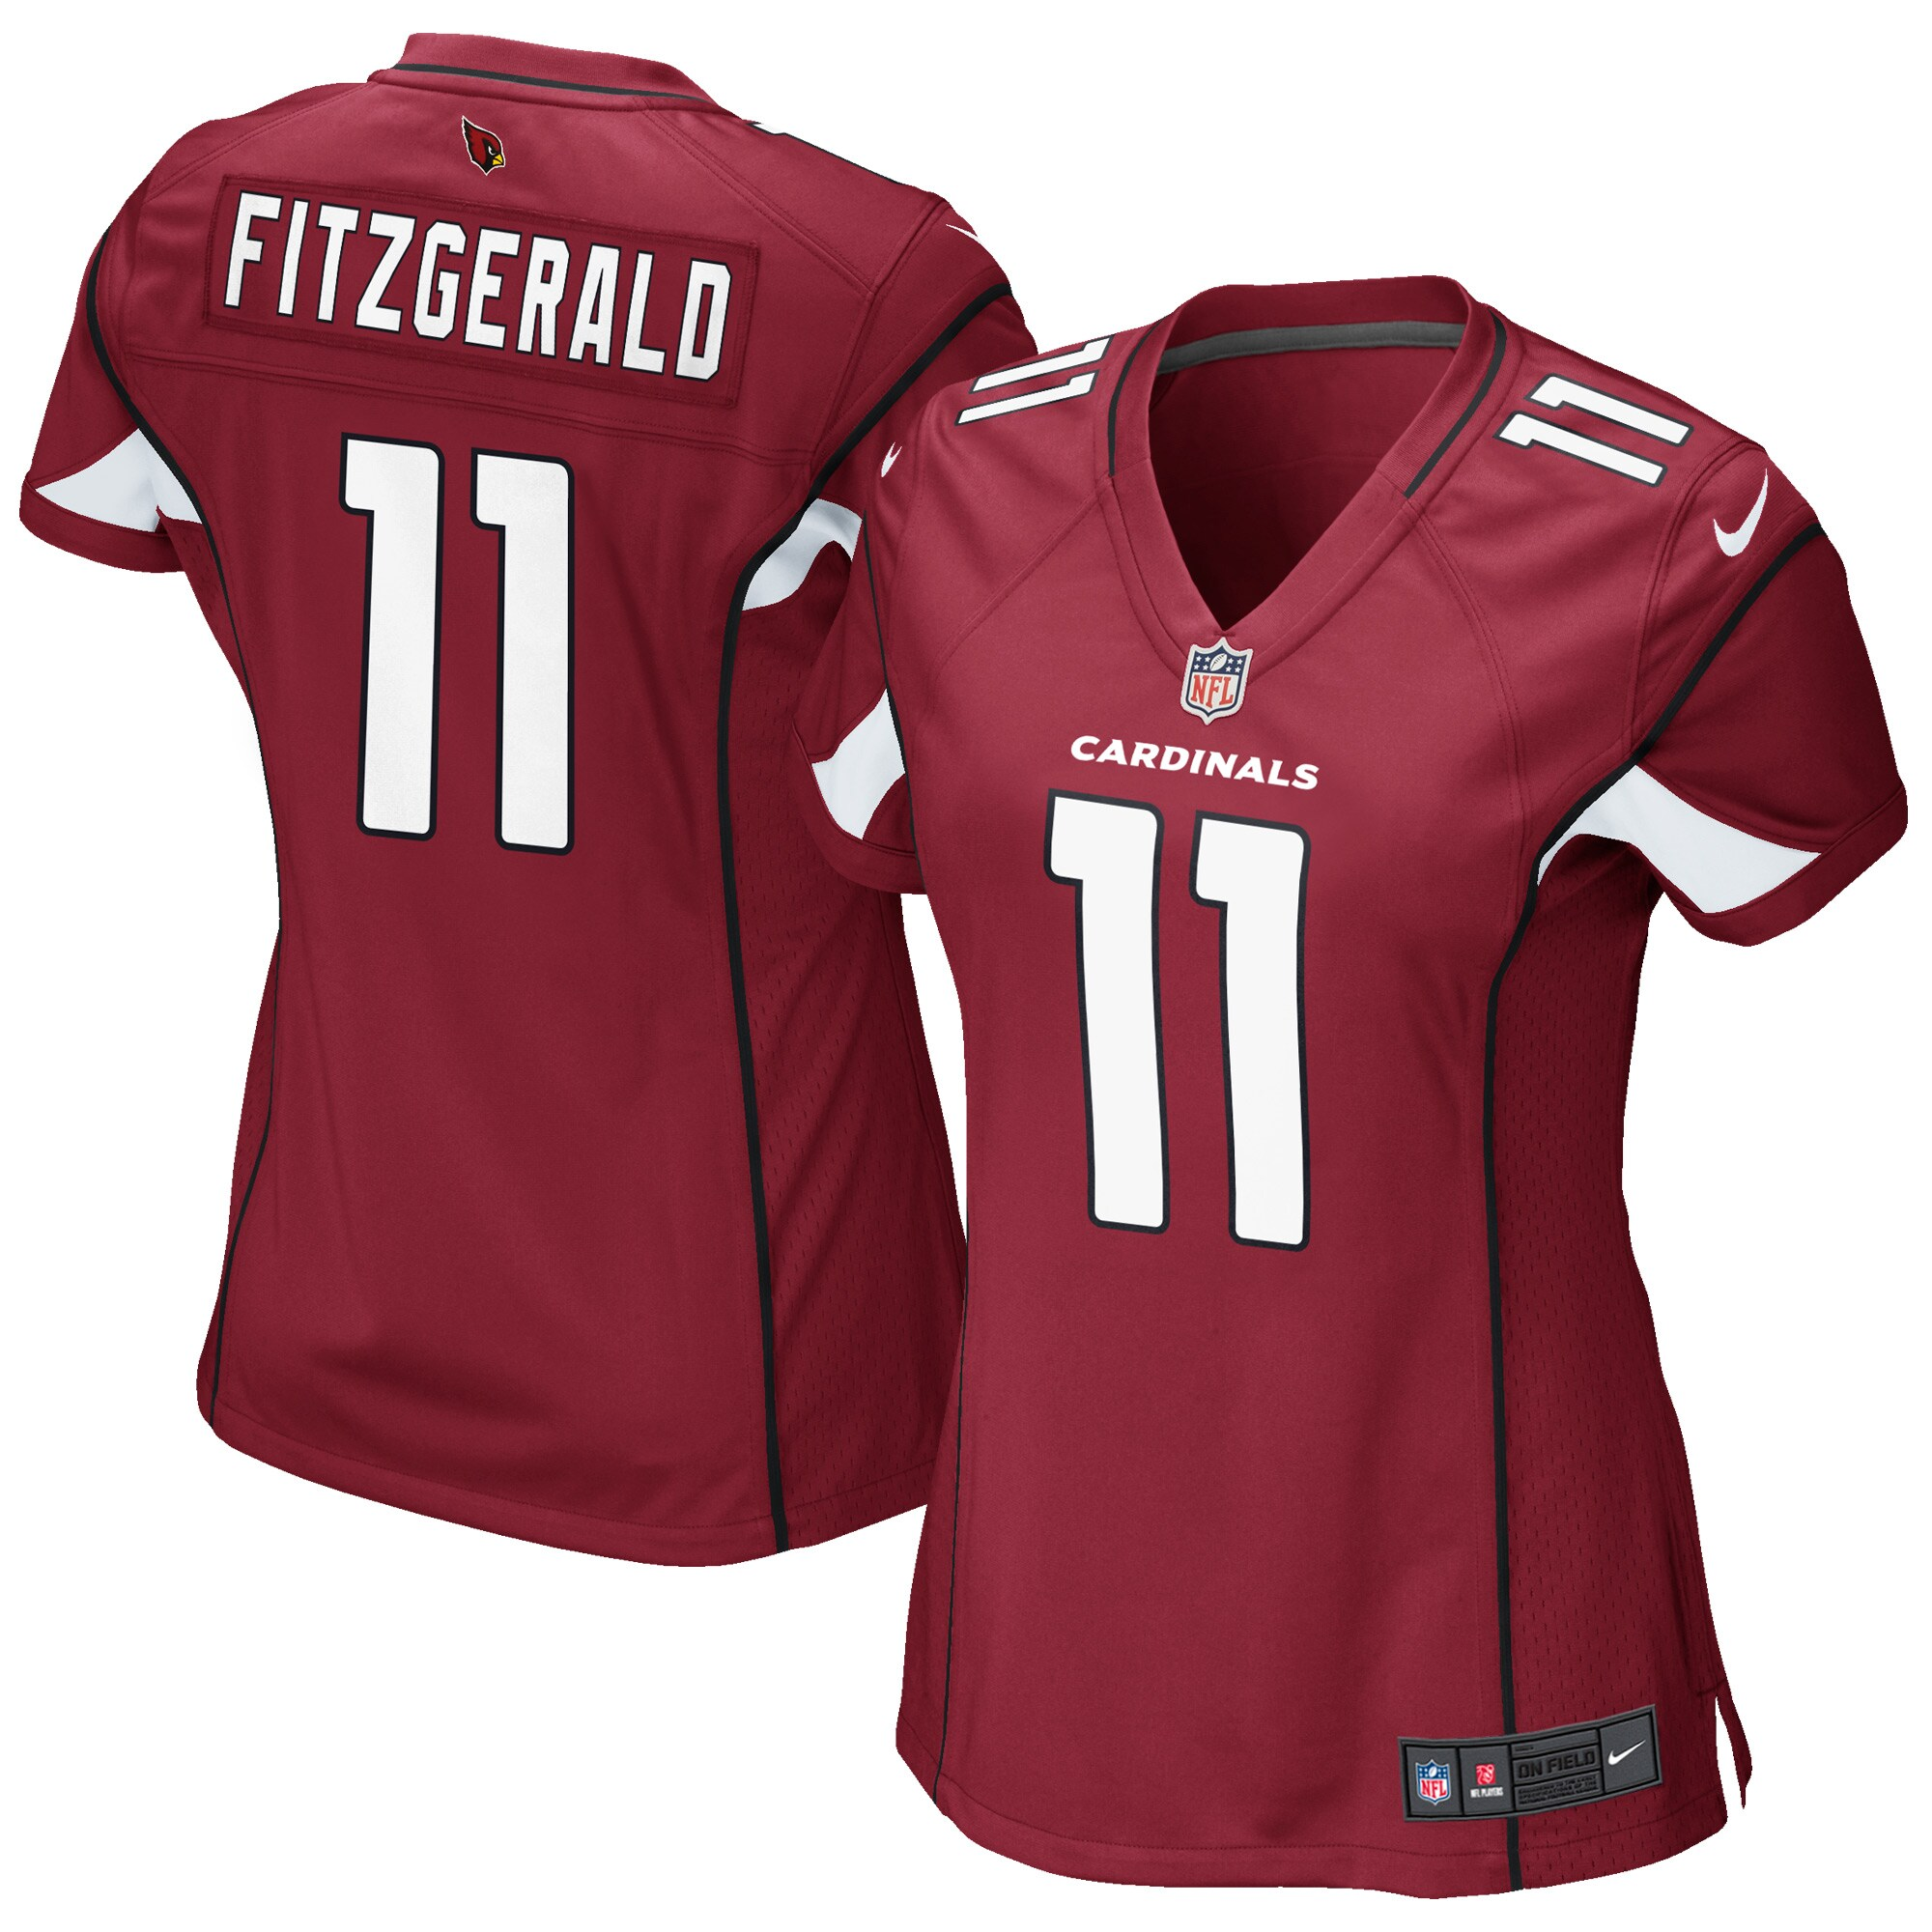 Larry Fitzgerald Arizona Cardinals Nike Girls Youth Replica Game Jersey - Cardinal